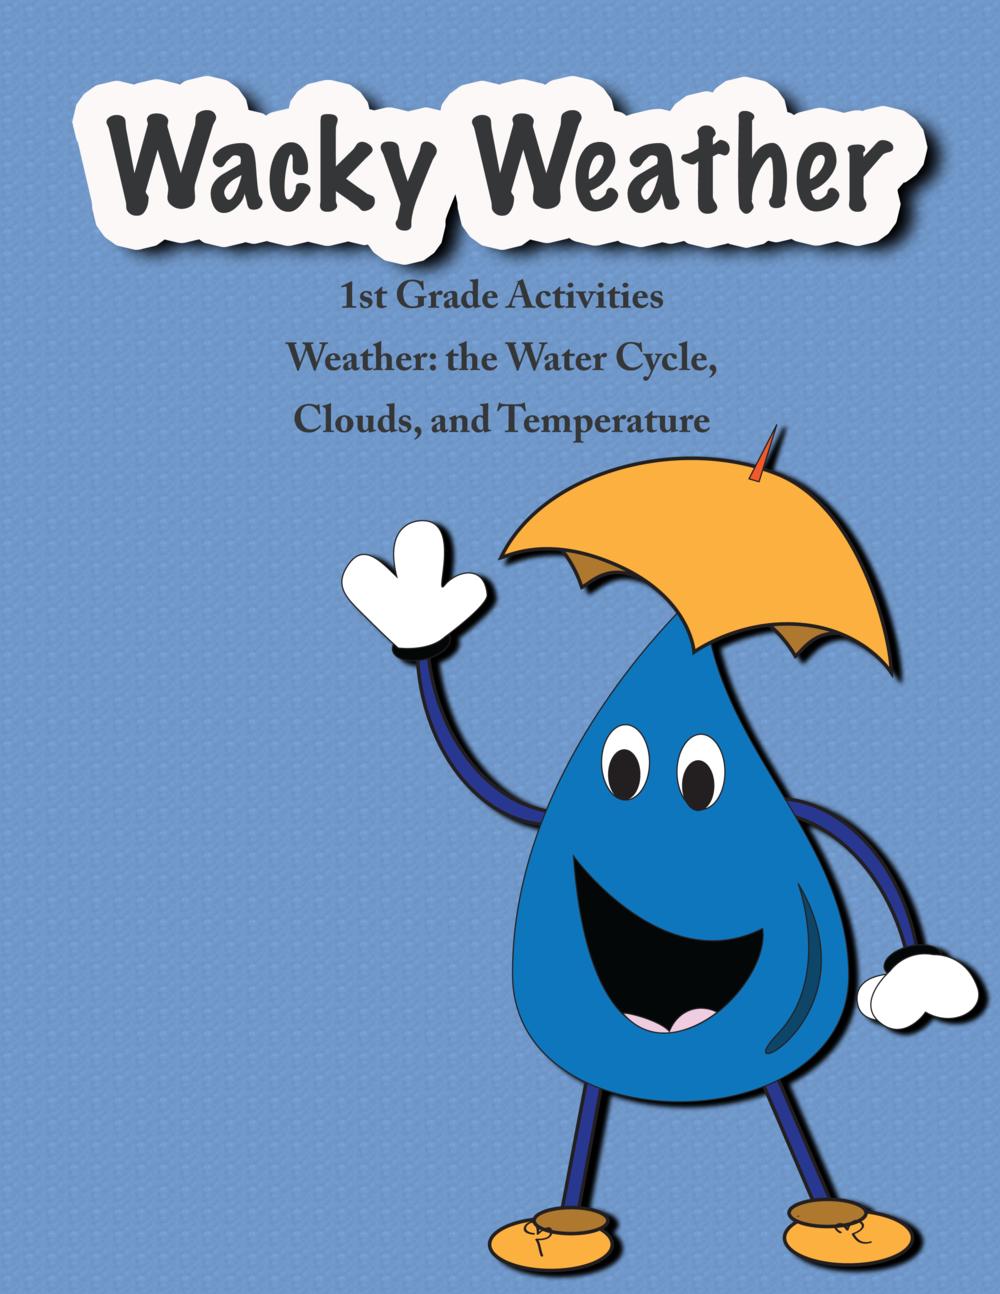 Wacky Weather